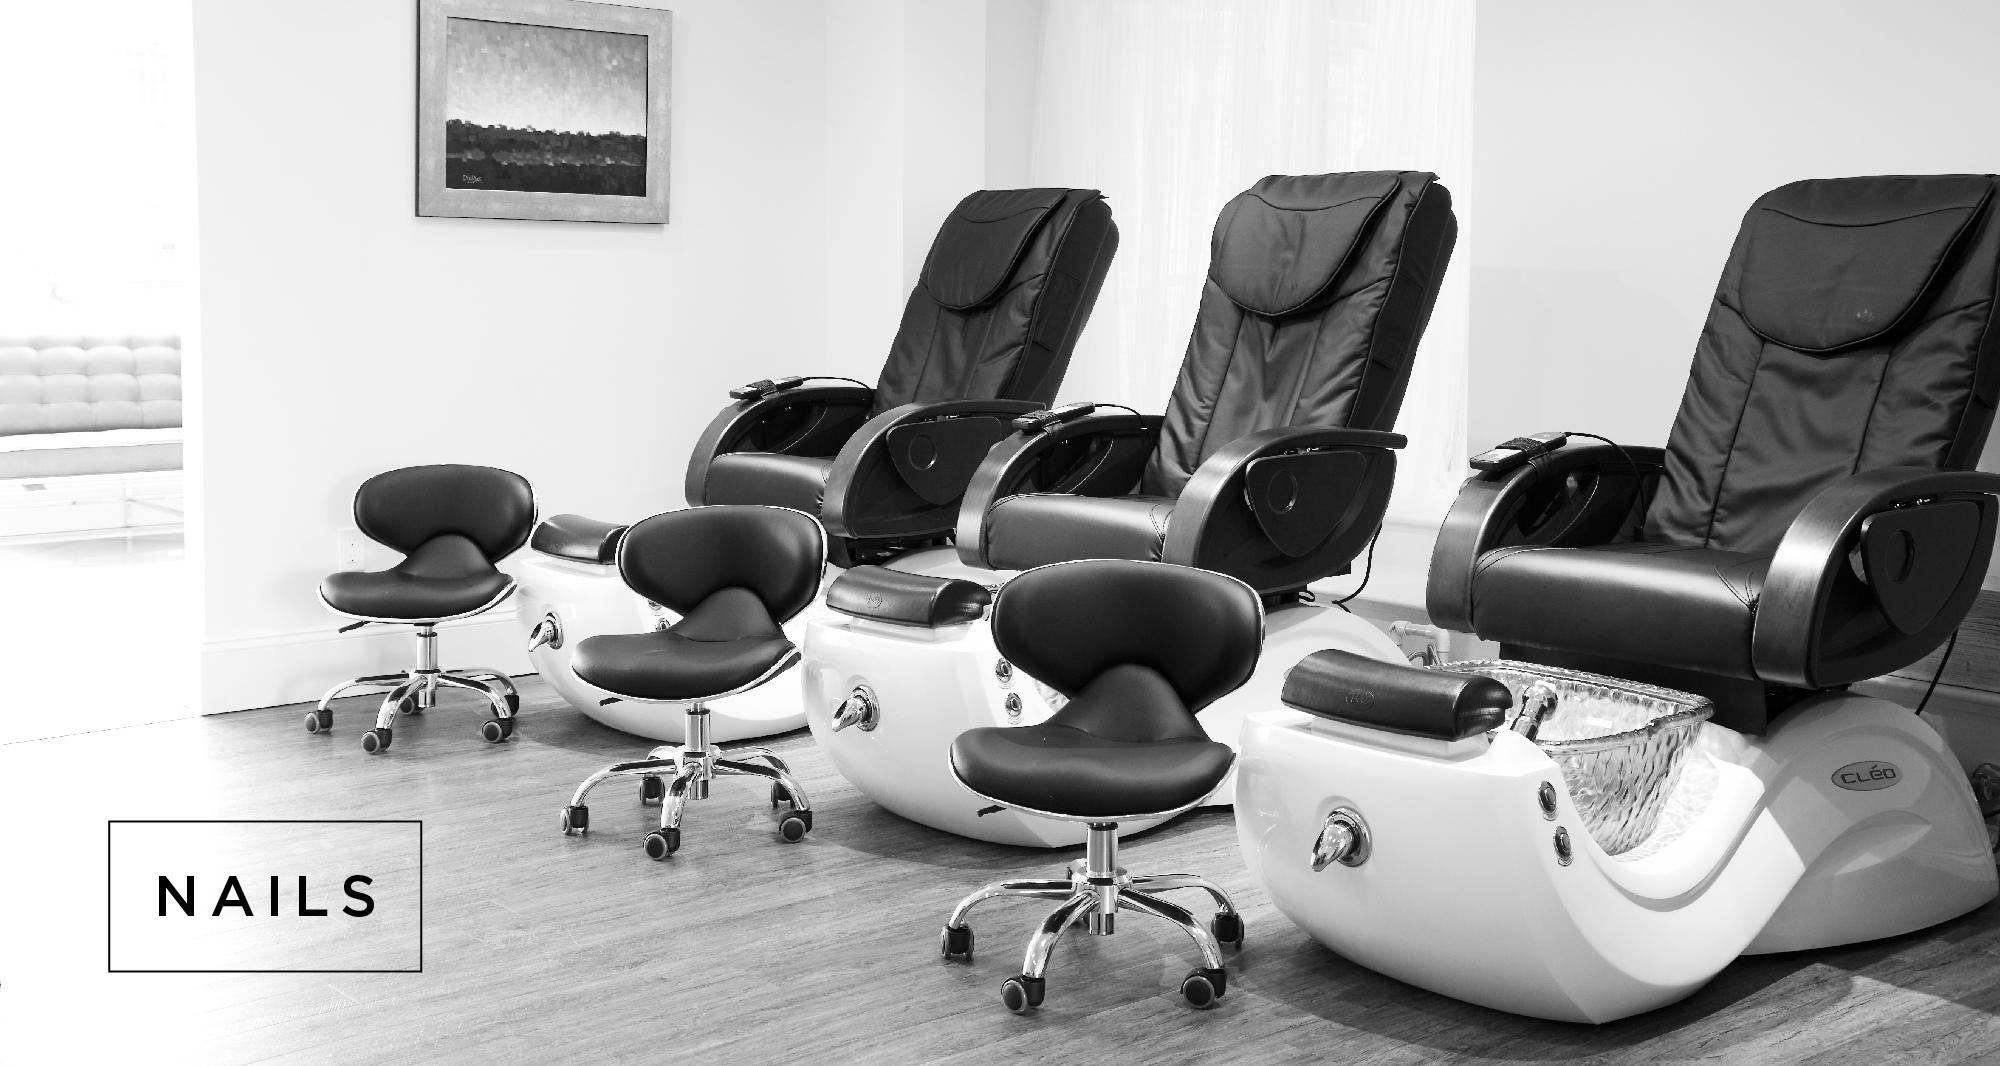 INTERLOCKS Salon + Spa Nails